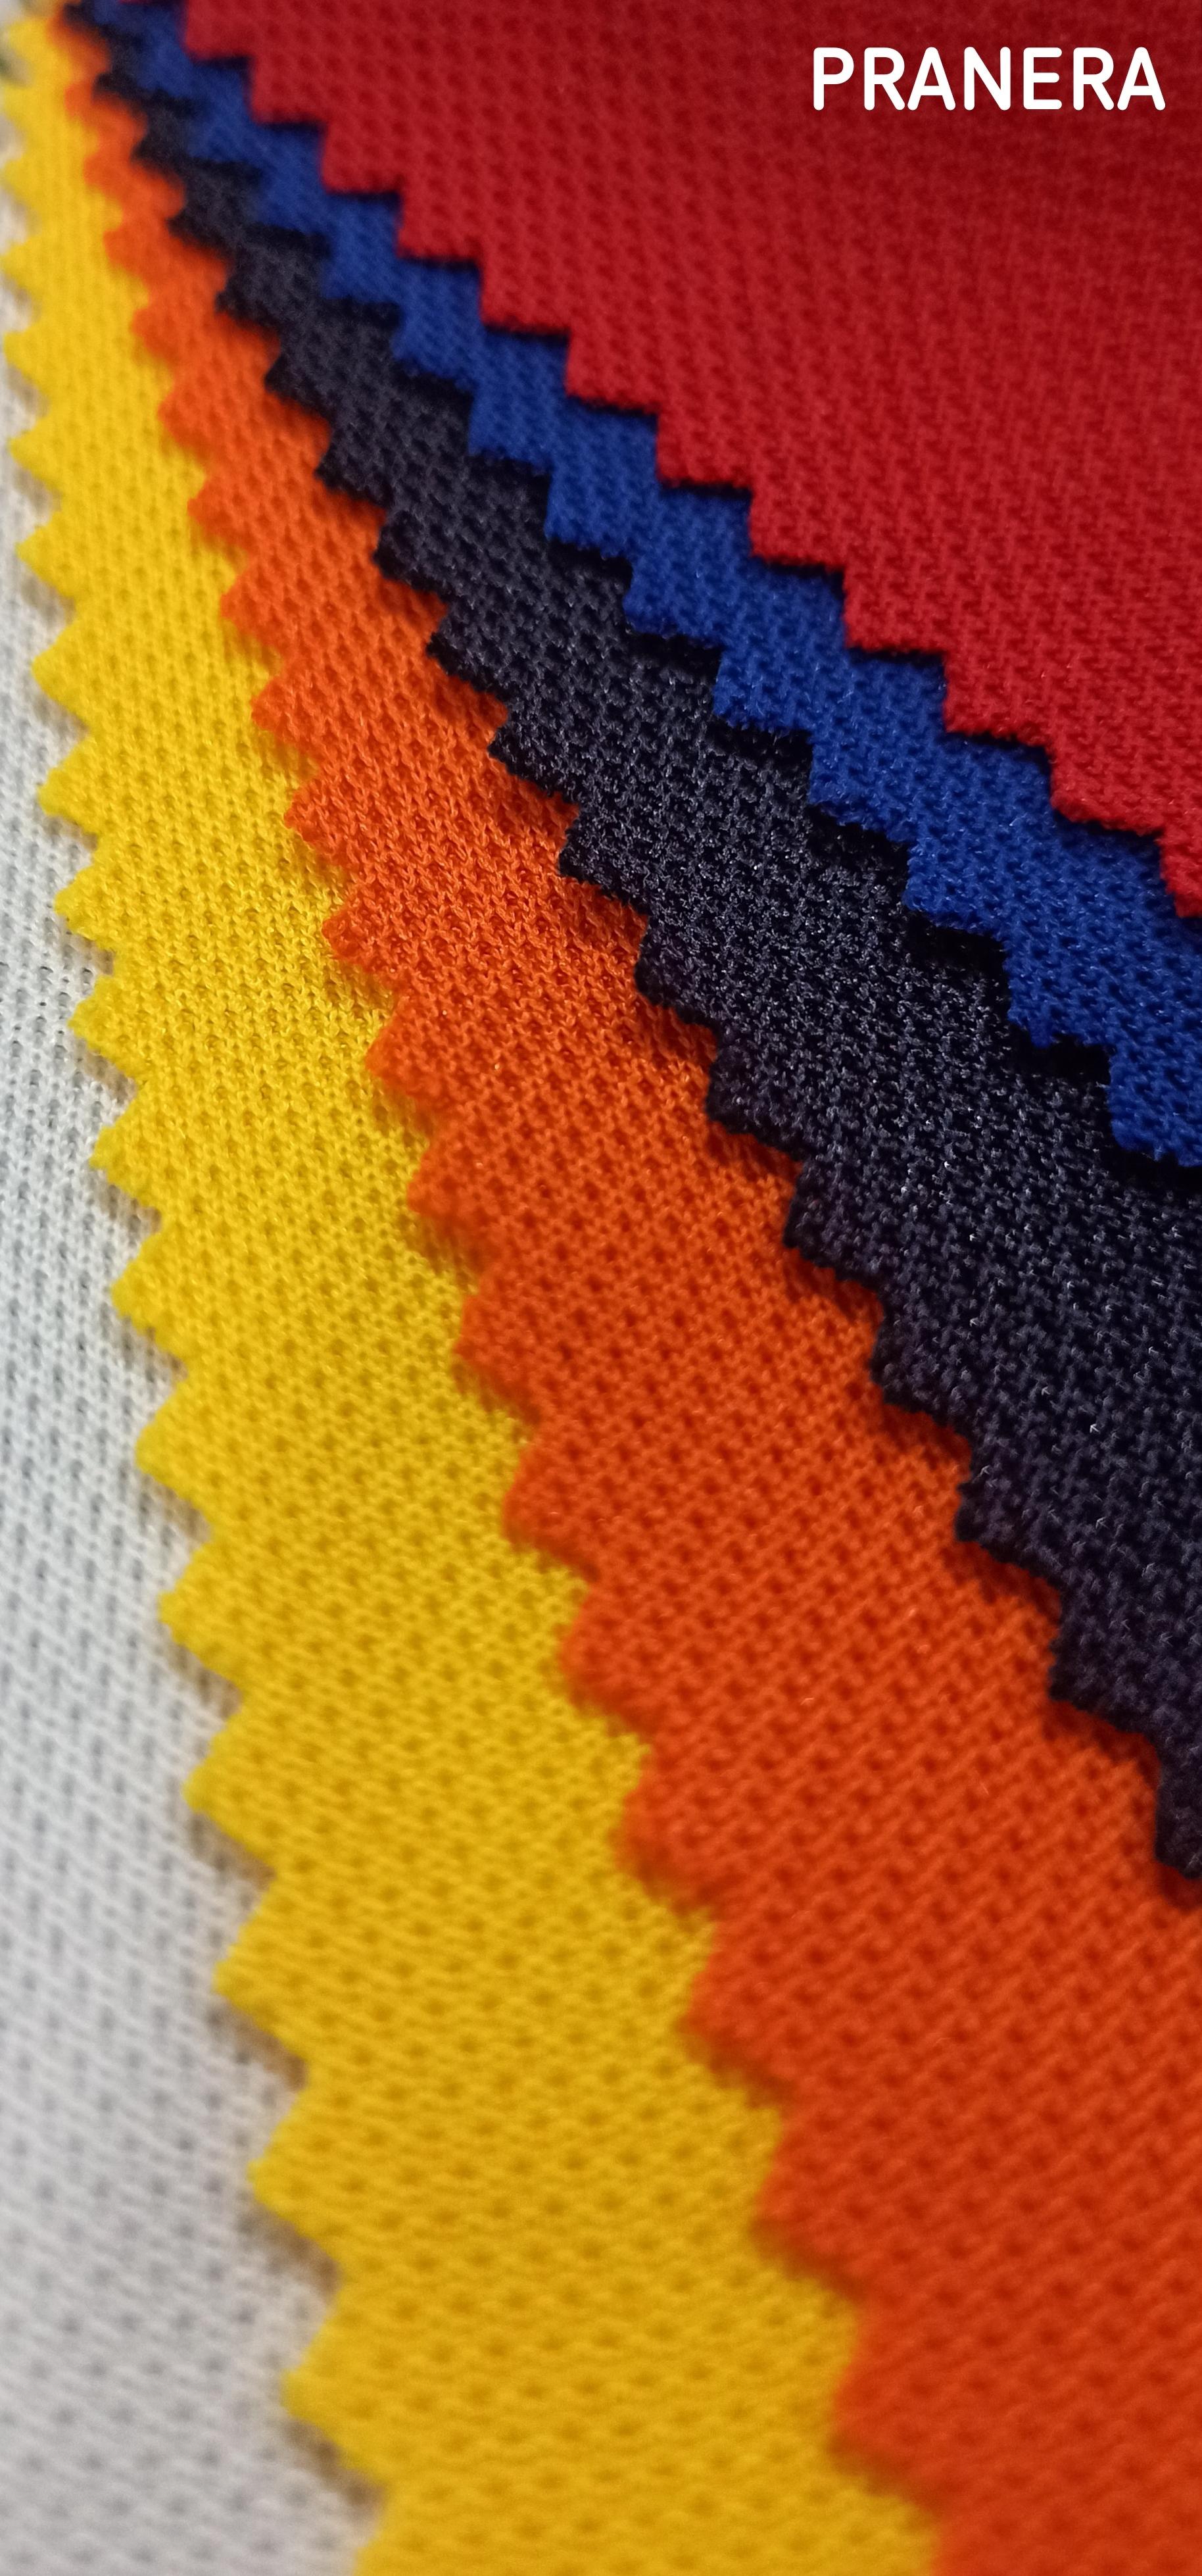 Polo T-Shirt Fabric